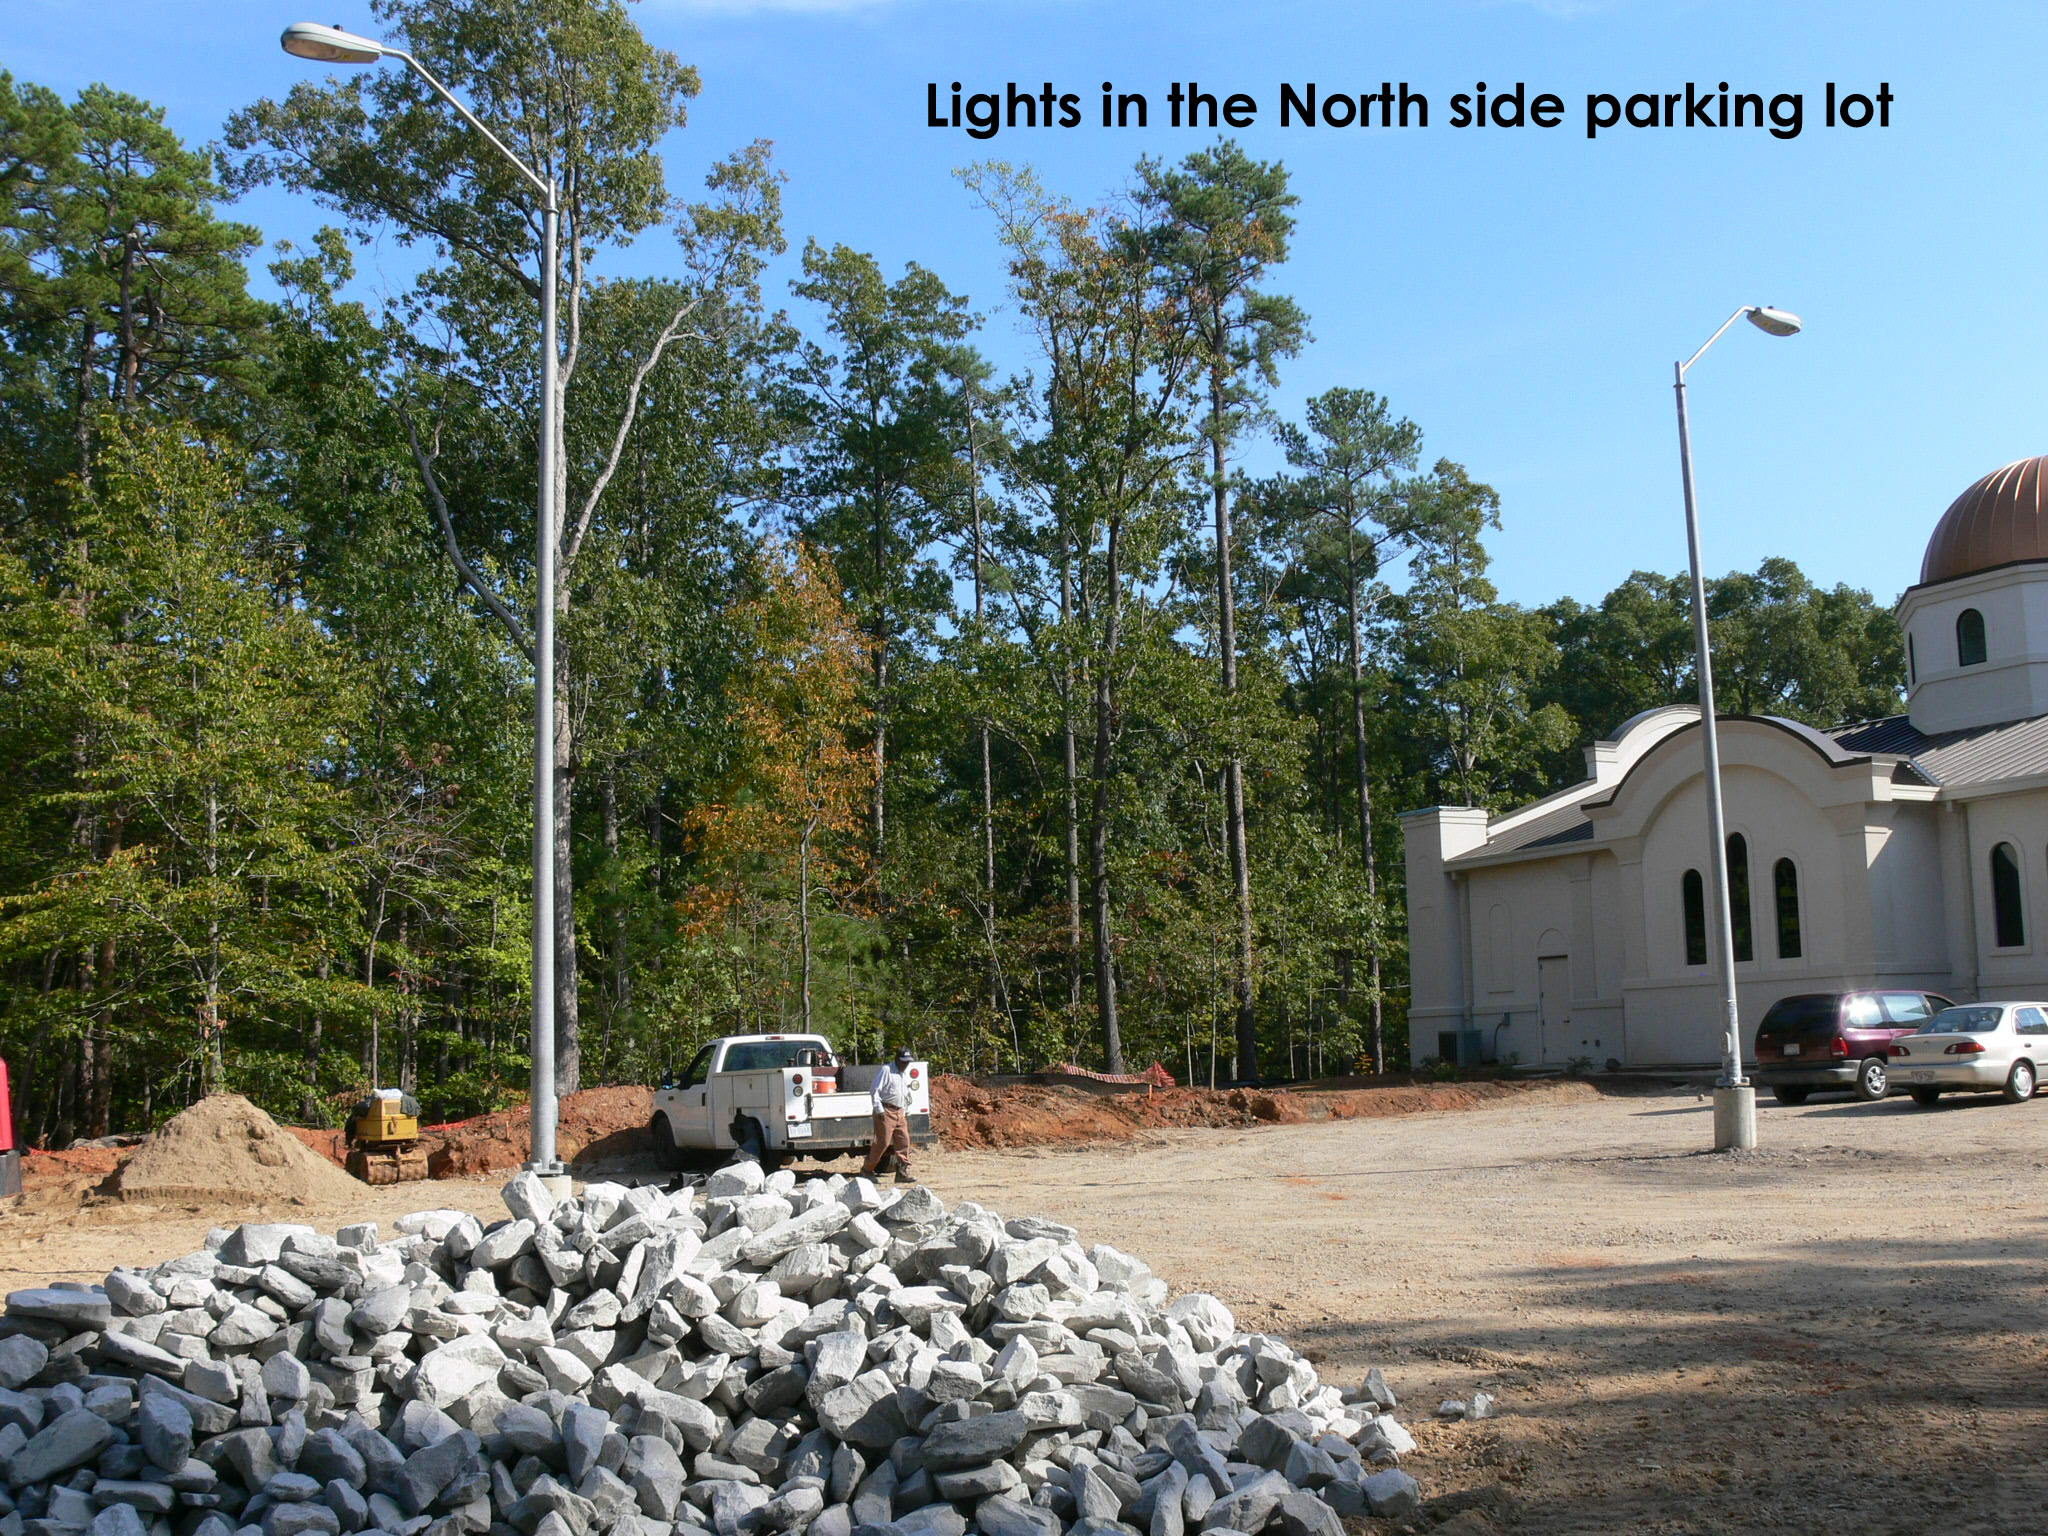 9-parking-lot-lights